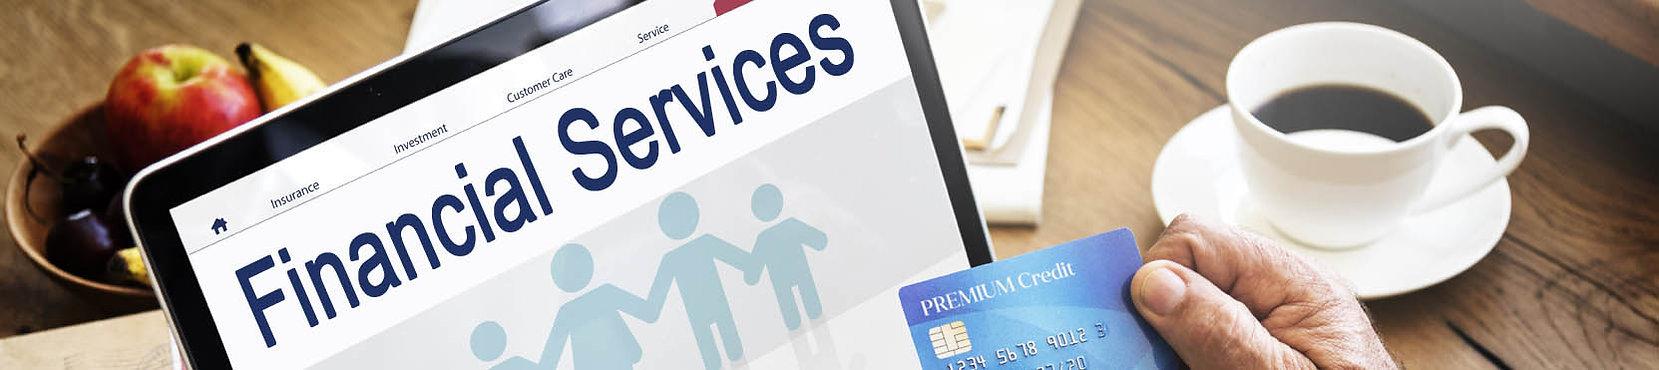 Financial_Services_banner.jpg